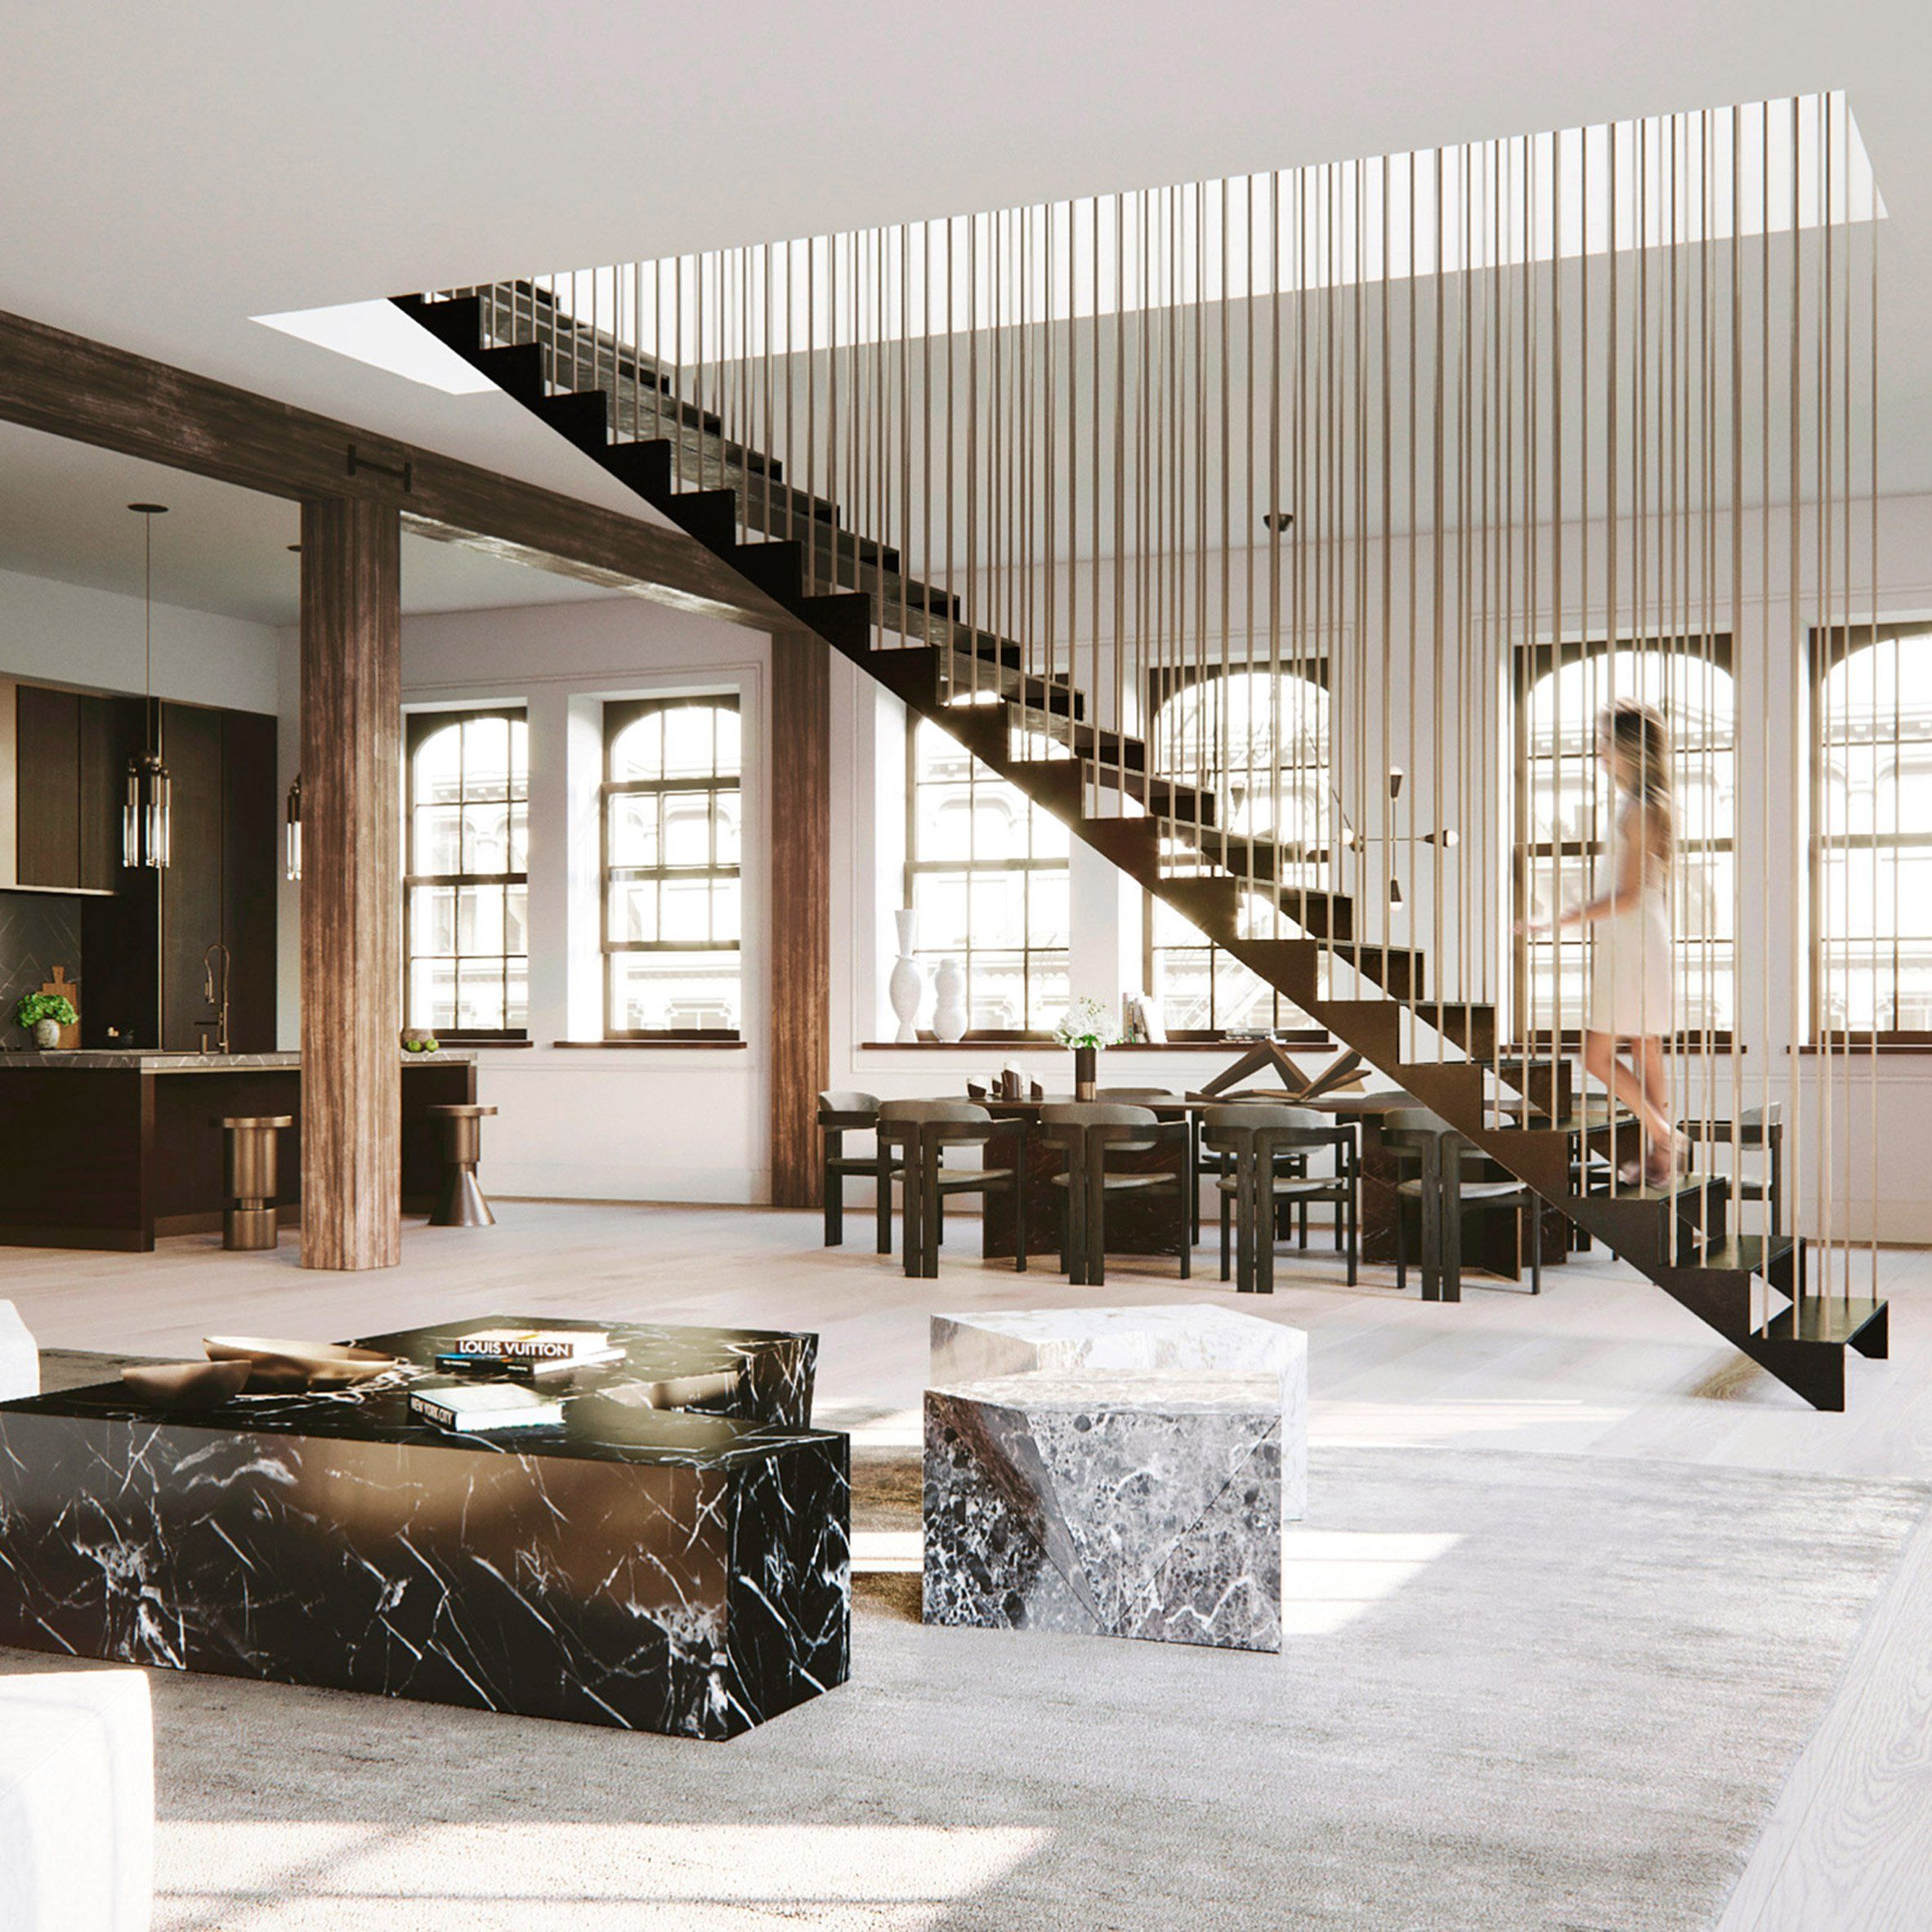 Manhattan New York Studio Apartments: Brooklyn Studio DJDS Has Redesigned The Interior A Loft